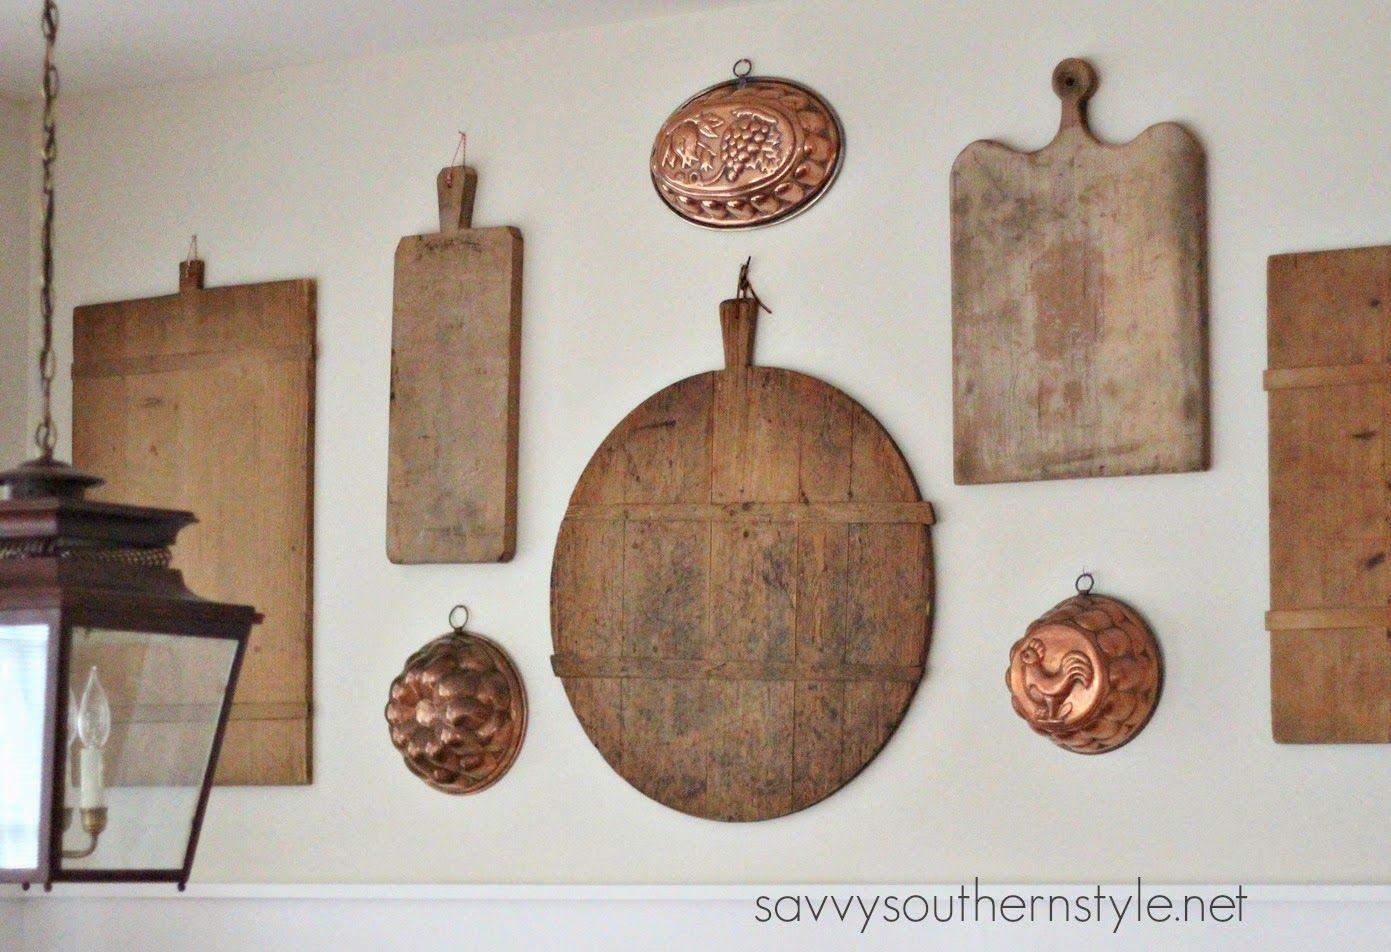 Gallery Wall In The Breakfast Room Kitchen Decor Items Kitchen Gallery Wall Kitchen Wall Decor